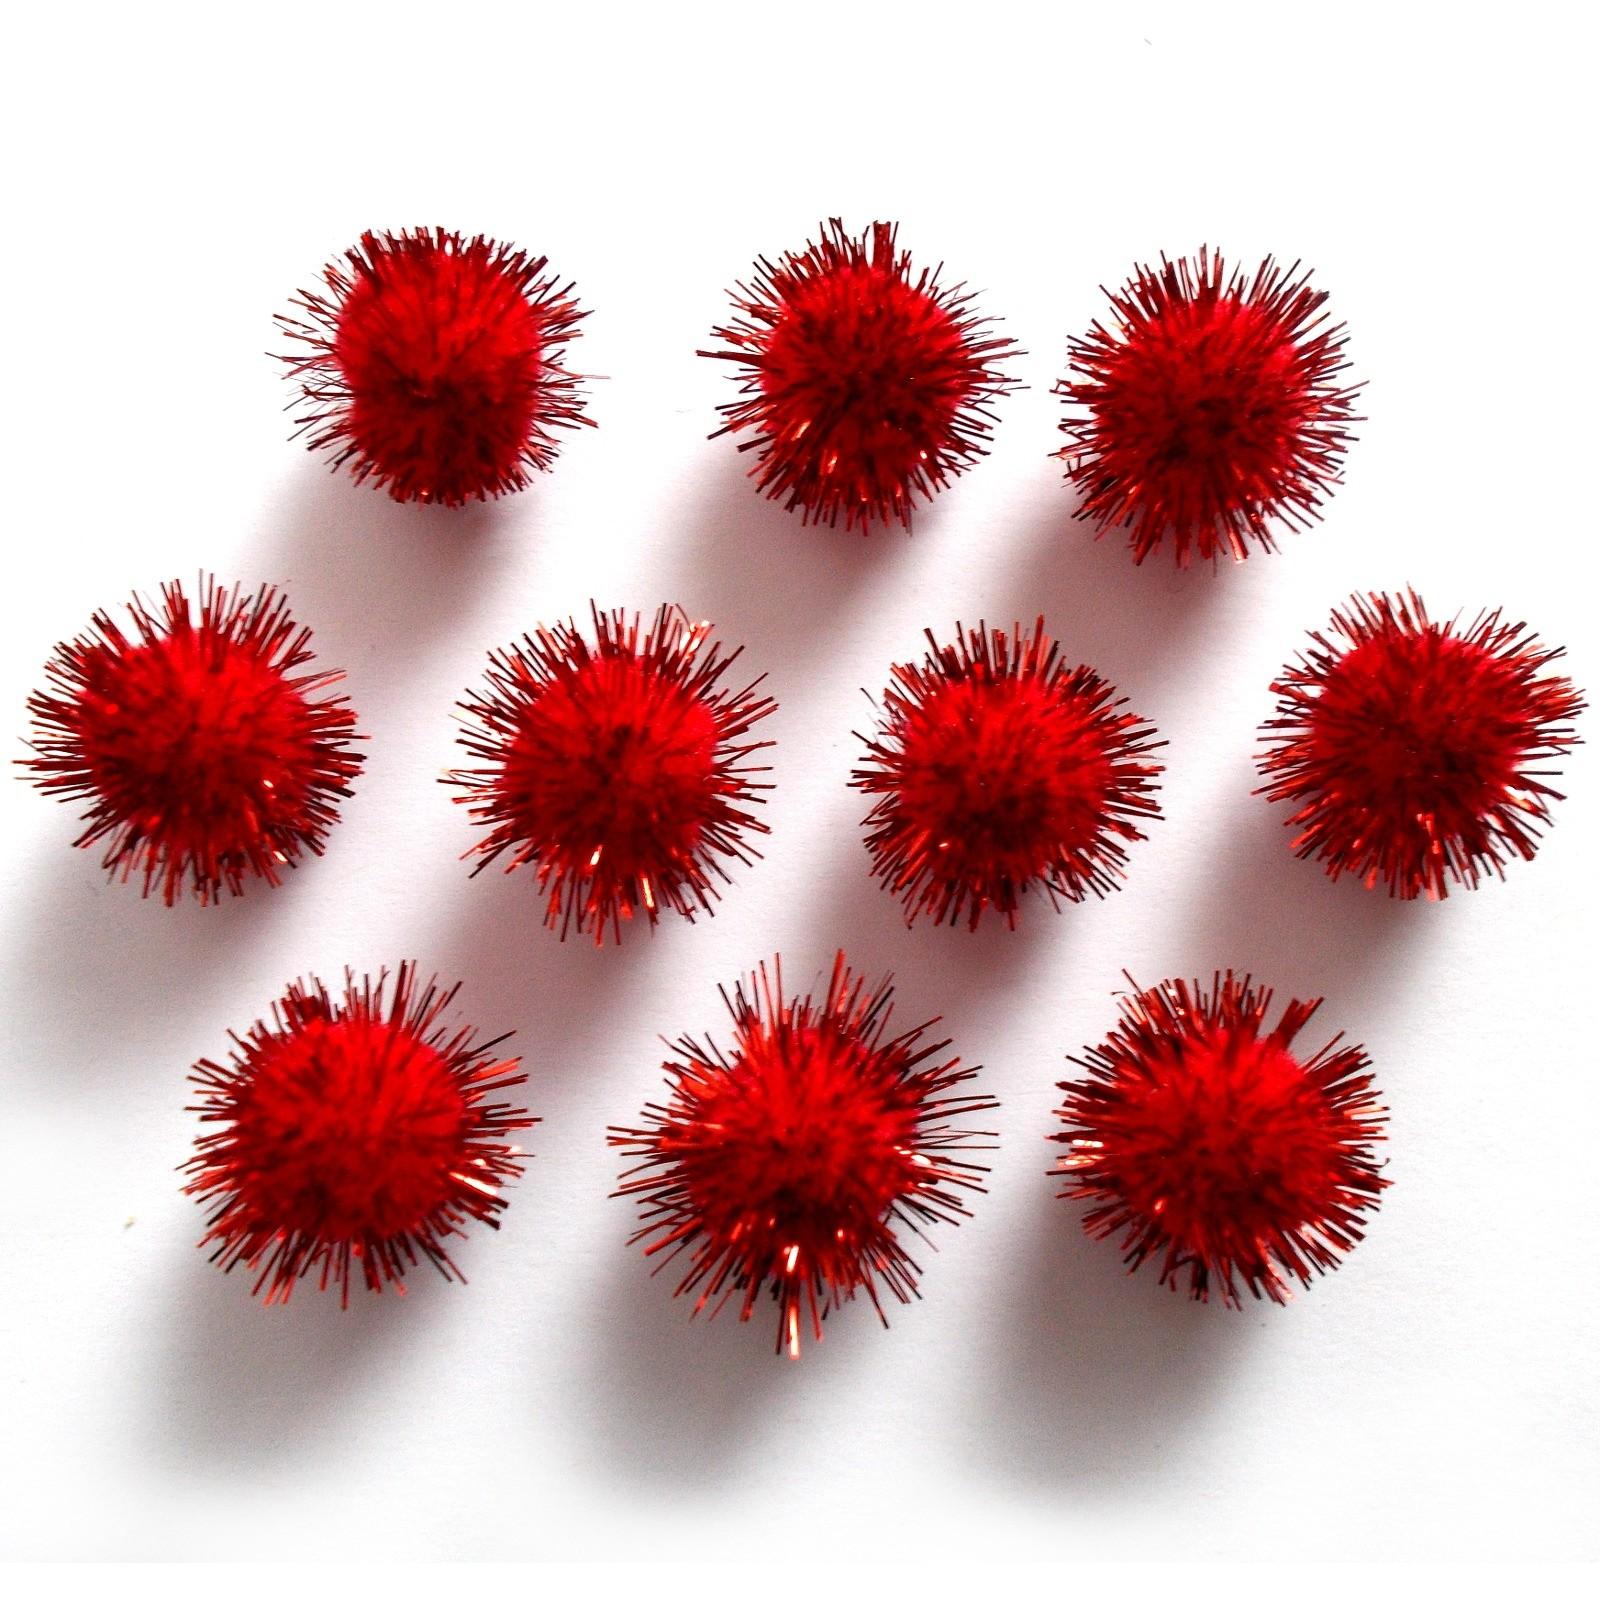 Metallic Pom Poms 13mm Red Pack of 10